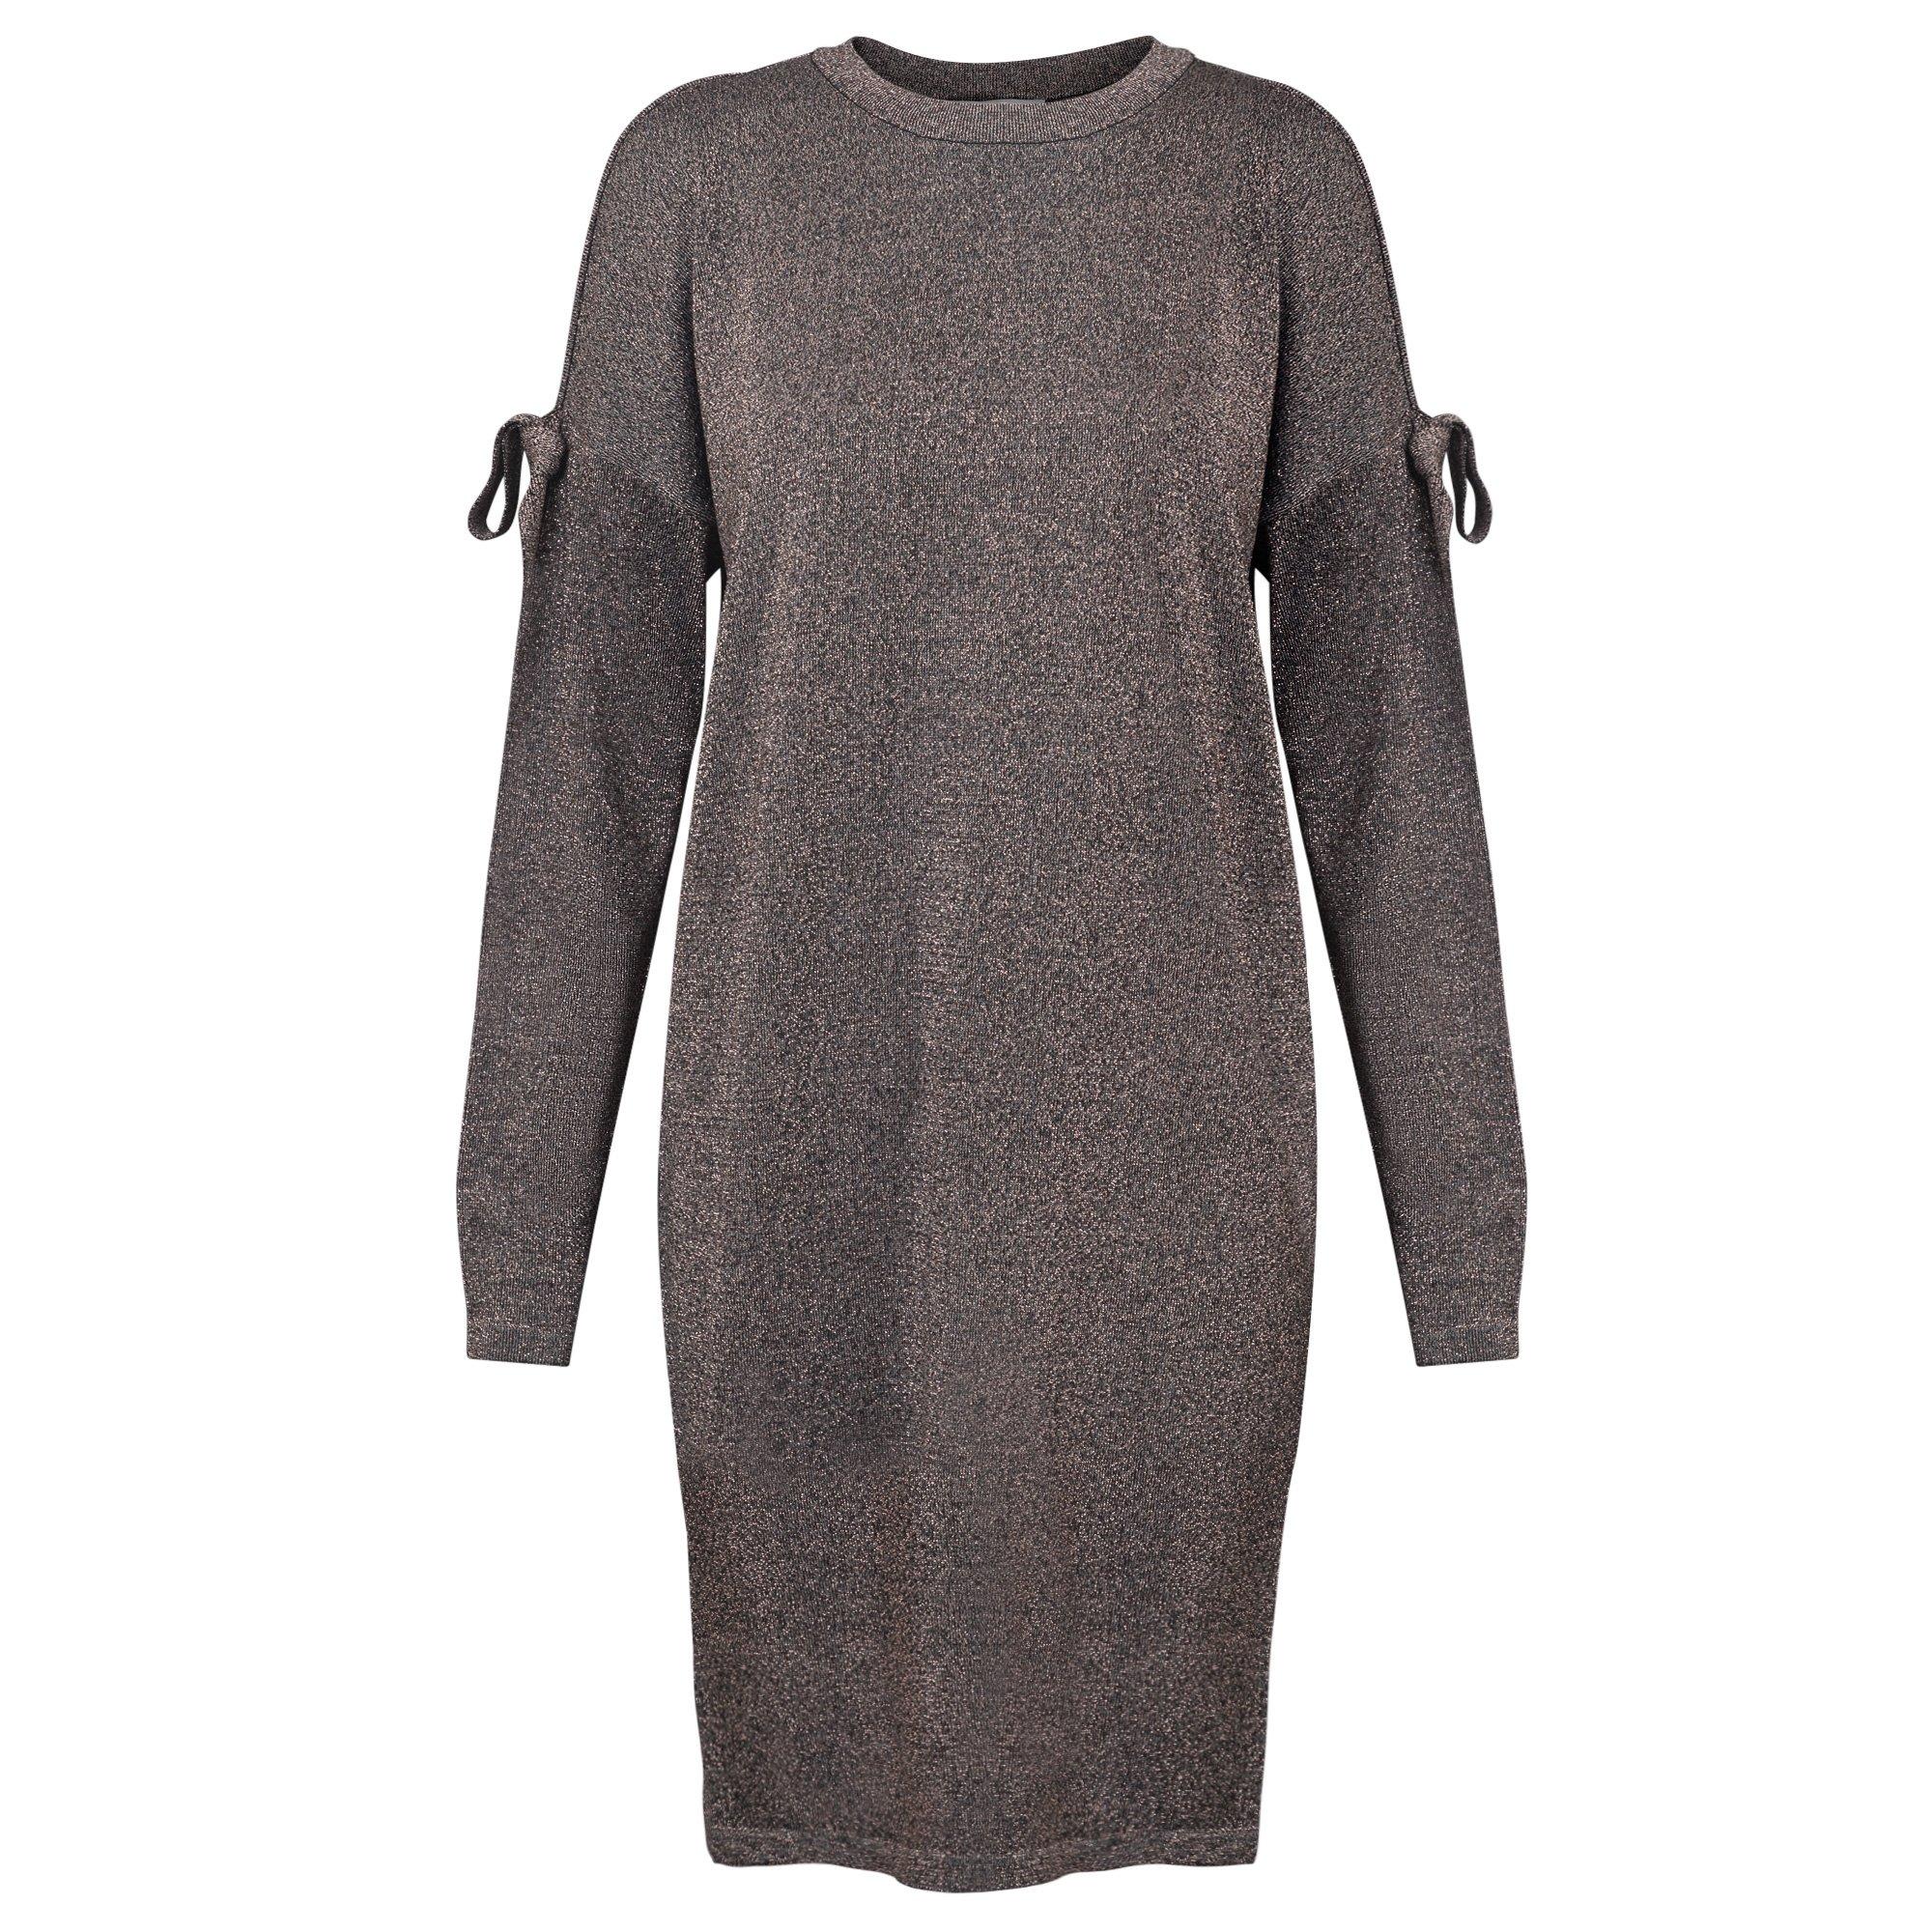 Oliver Bonas Dash Sparkle Tie Sleeve Knitted Dress, size 14